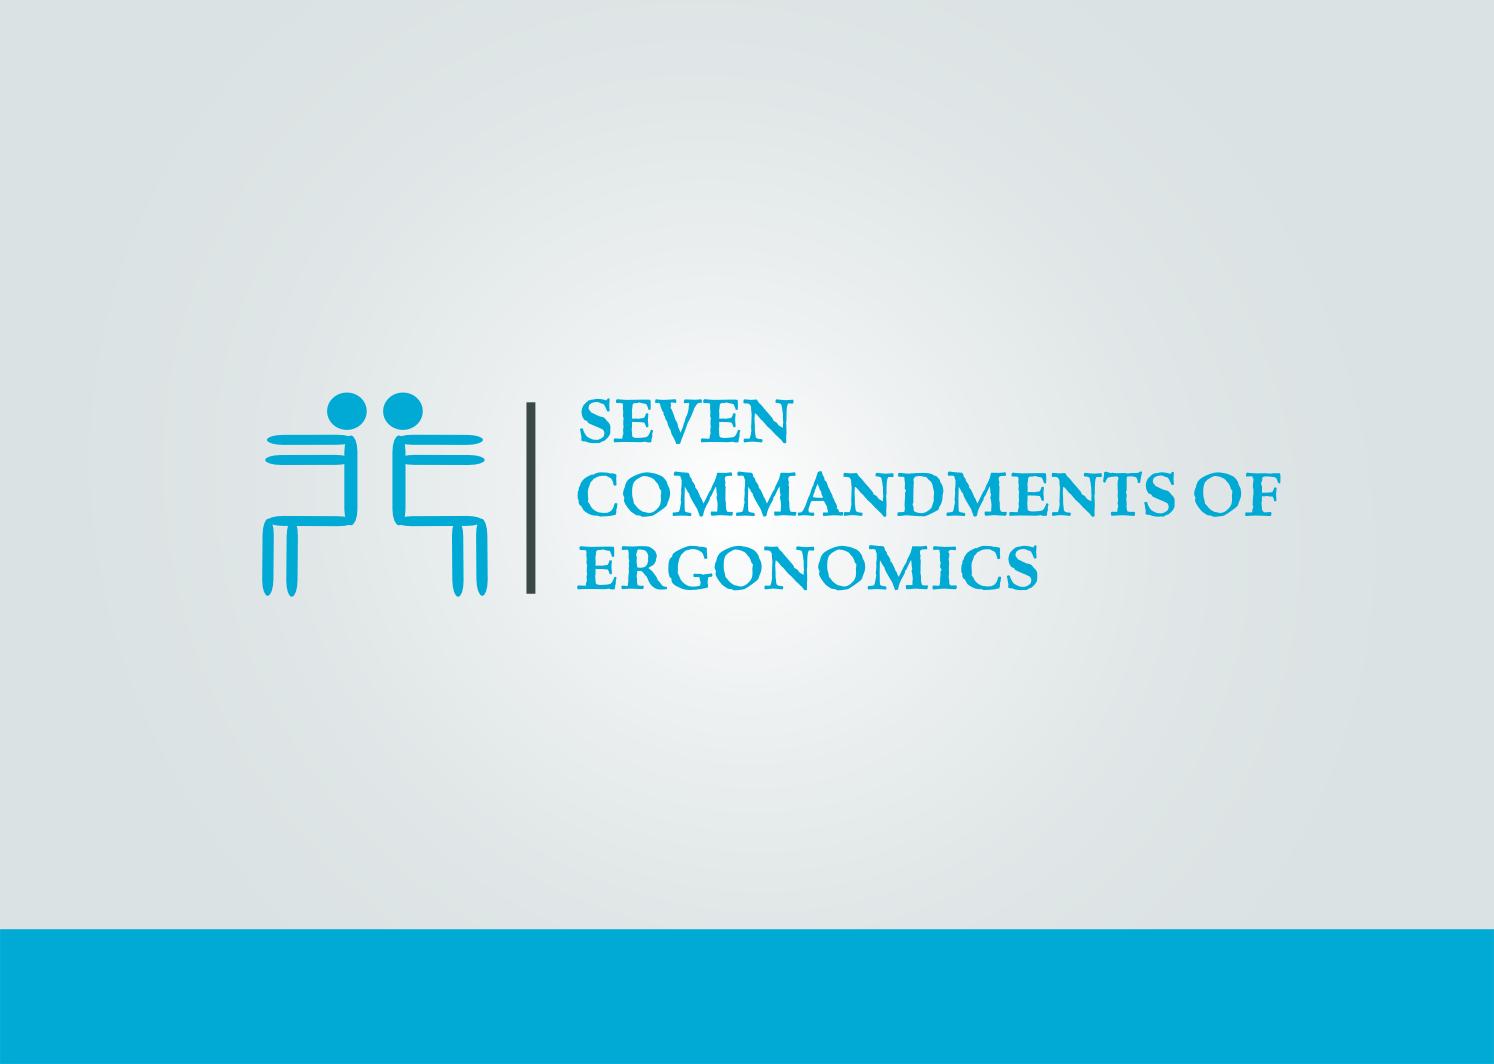 Logo Design by Joseph calunsag Cagaanan - Entry No. 81 in the Logo Design Contest Logo Design for Seven Commandments of Ergonomics.